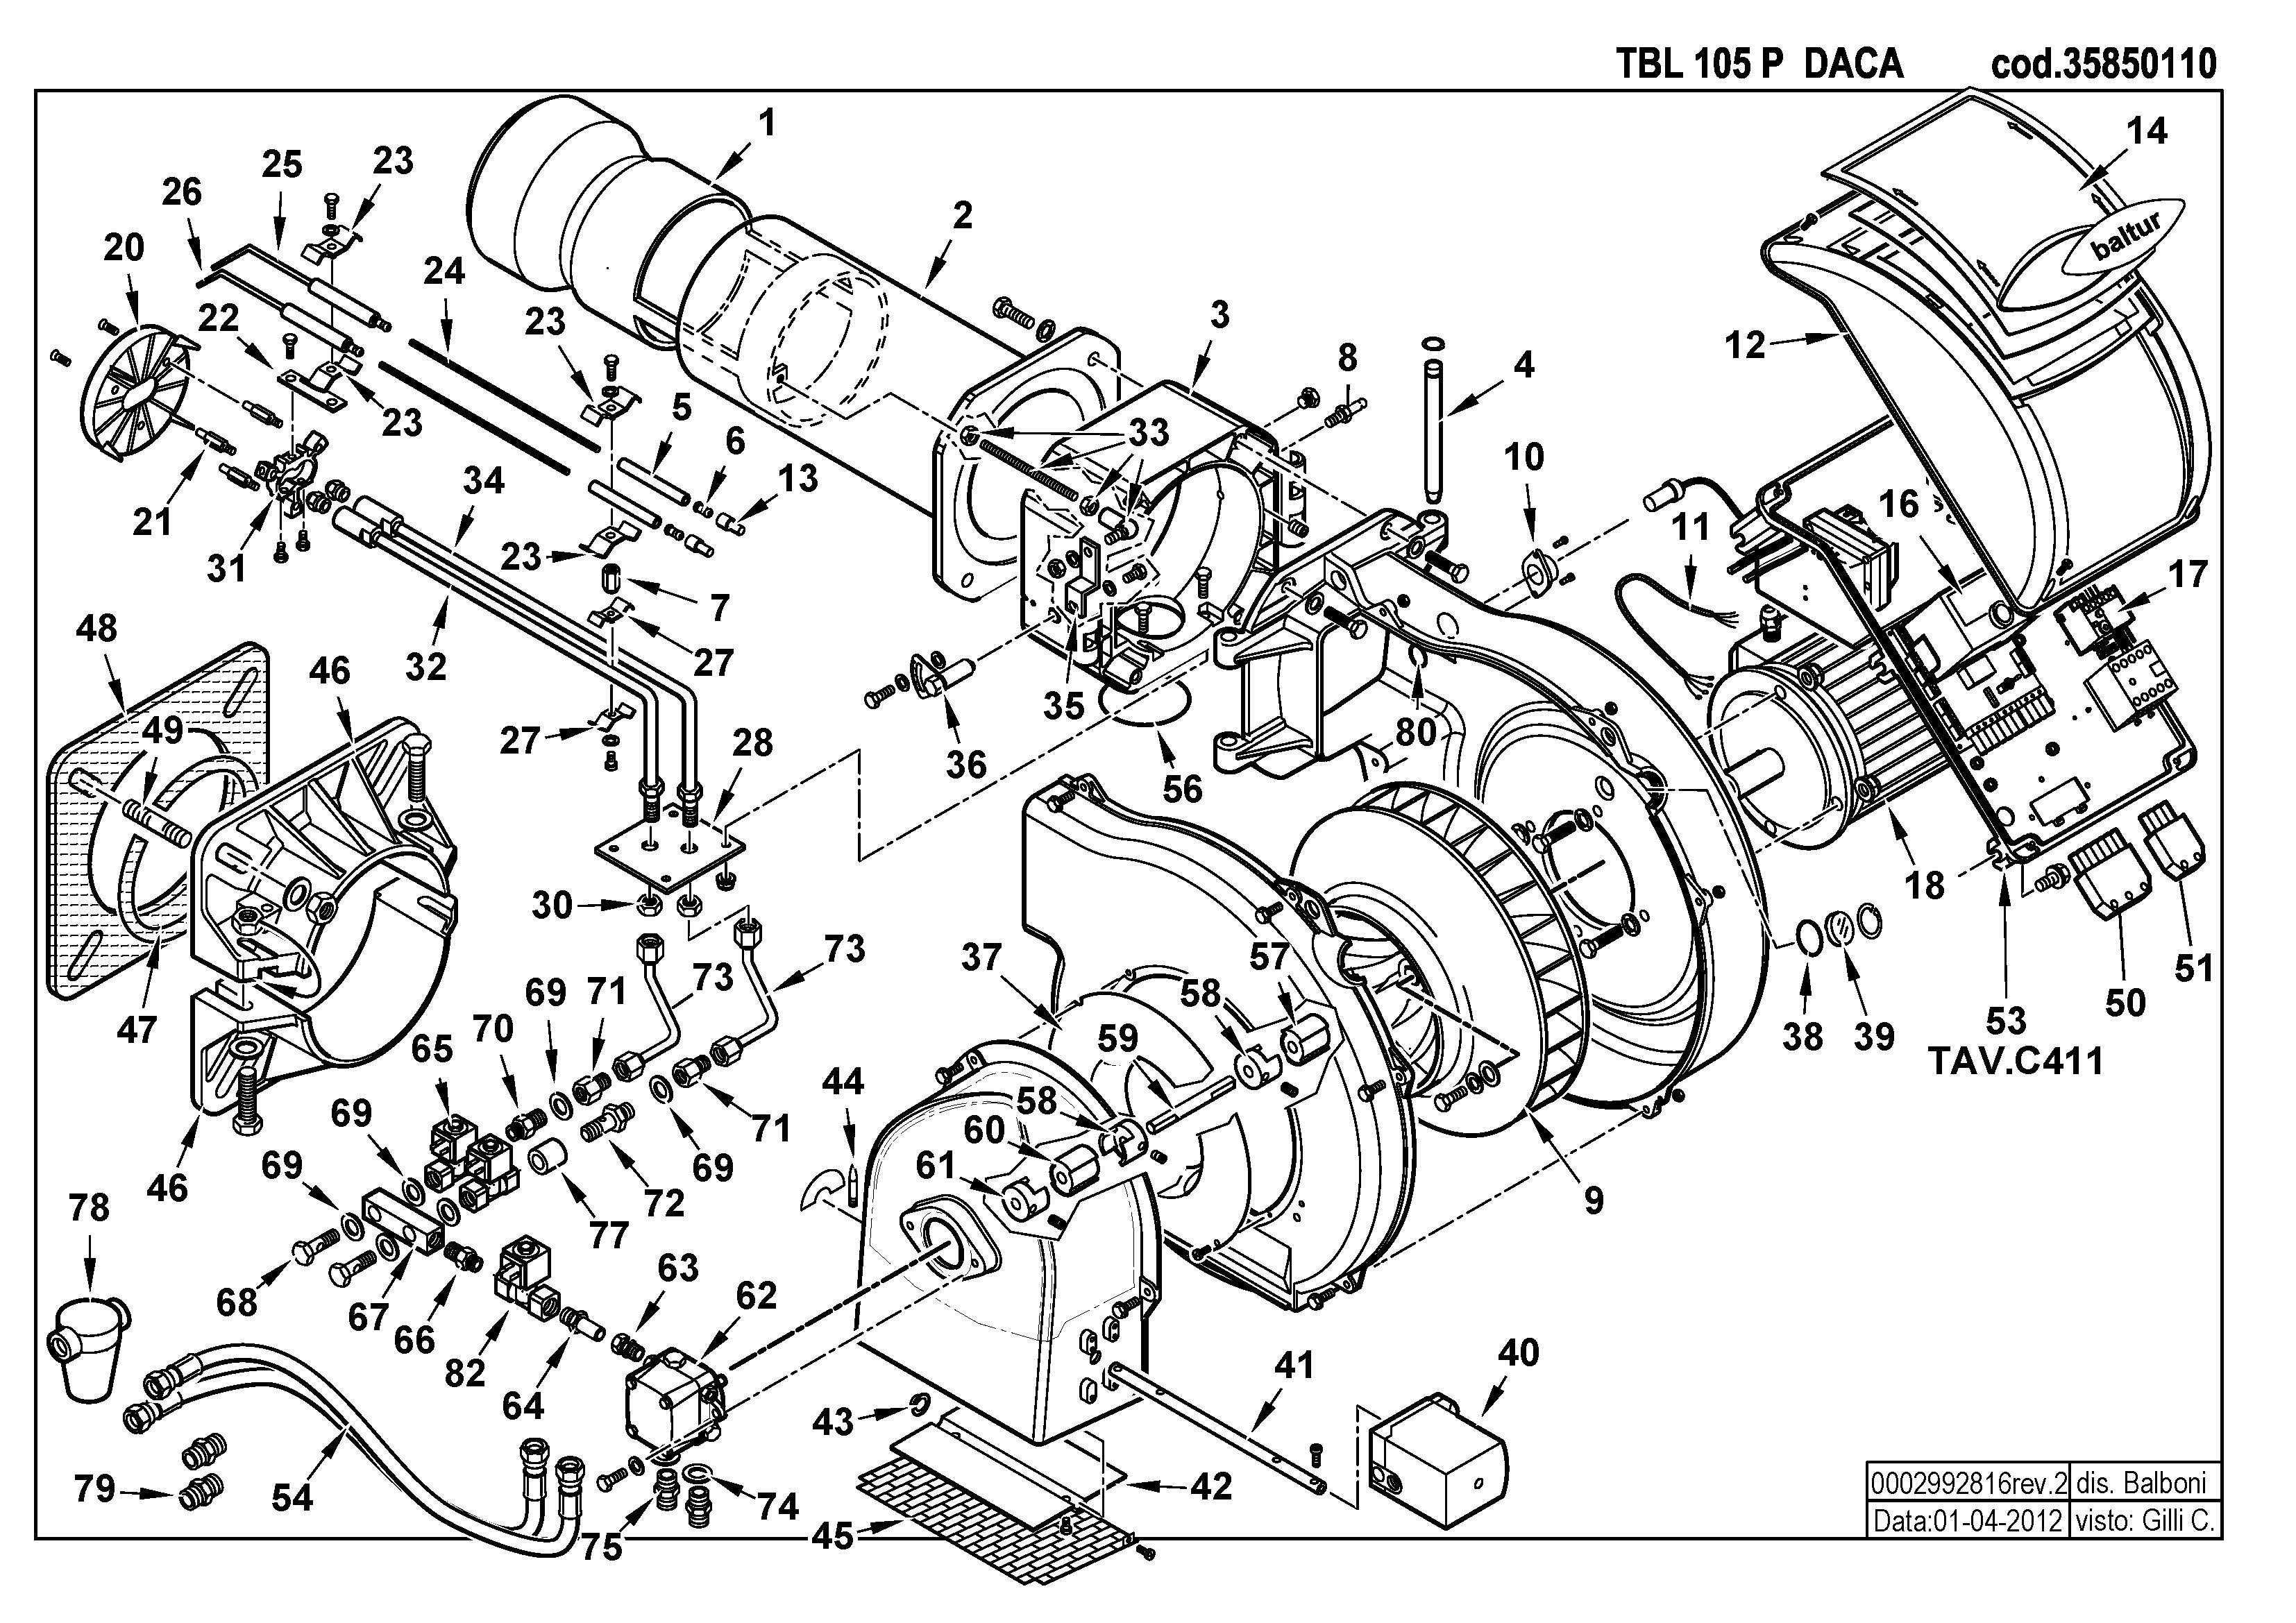 TBL 105 P DACA 35850110 2 20120401